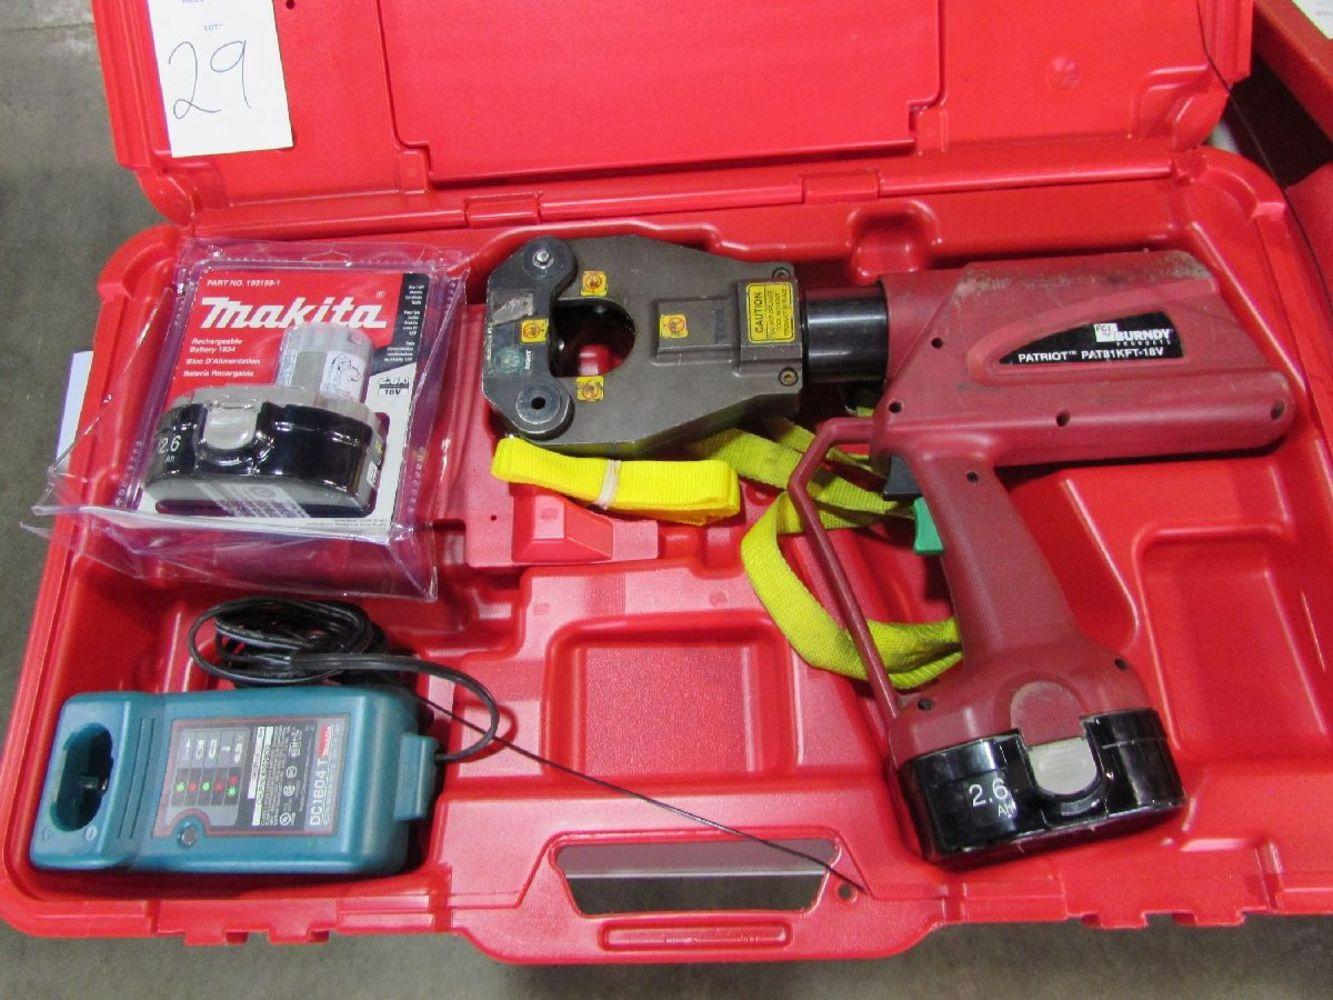 2-Day Auction: Complete Electrical, Instrumentation & Facilities Maintenance Shop (Philadelphia Energy Solutions Sale #1)